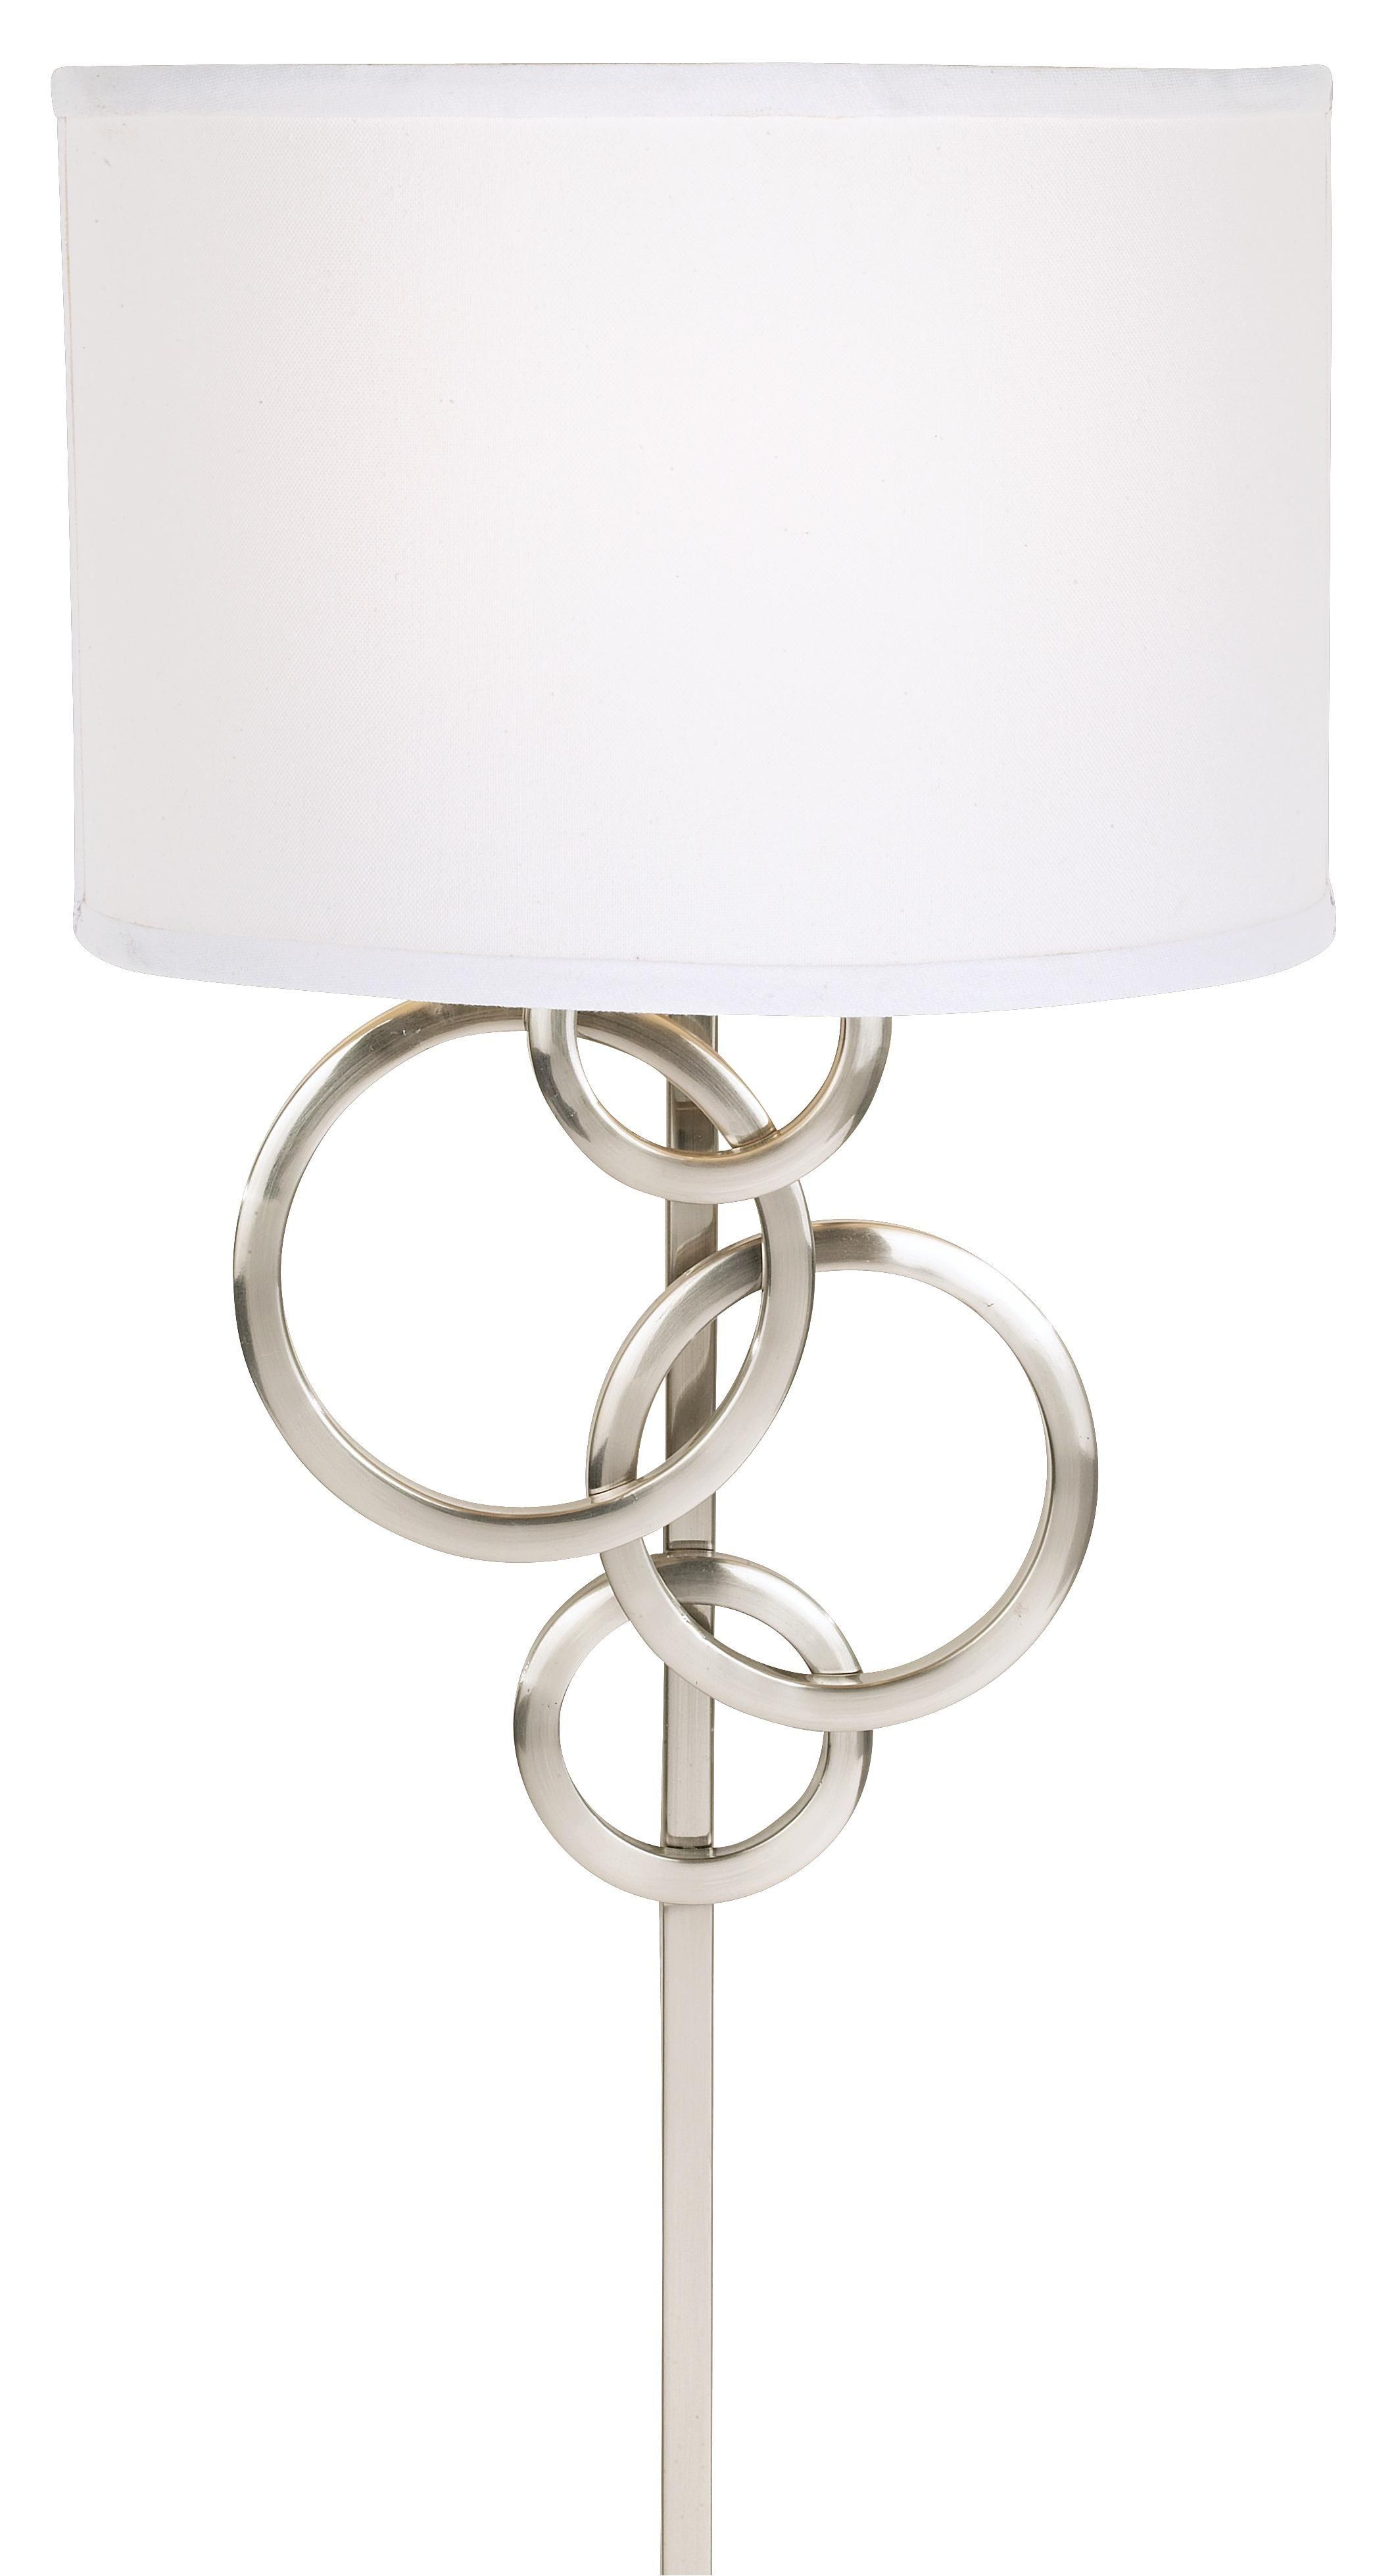 Possini Euro Design Circles Plug In Wall Sconce With Cord Cover 70954 Lamps Plus Plug In Wall Sconce Wall Sconces Bedroom Plug In Wall Lamp